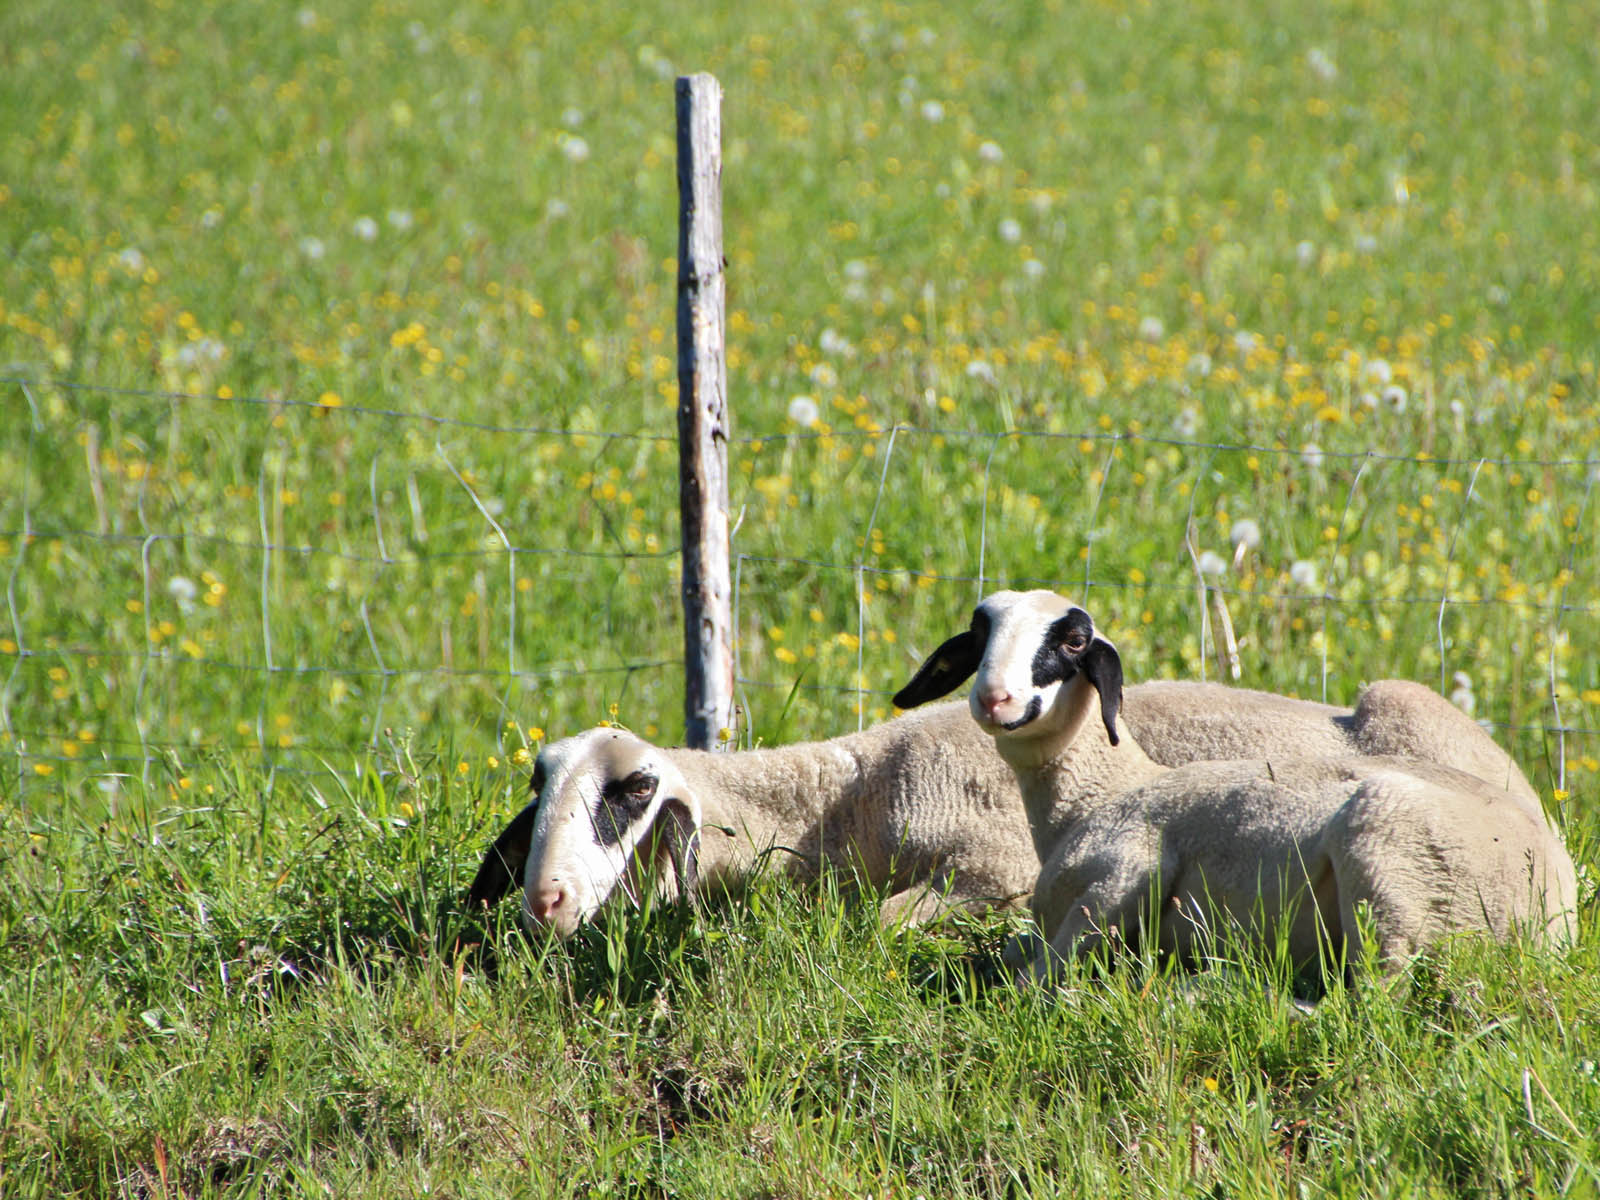 Die Schafe  genießen die wärmende Frühlingssonne